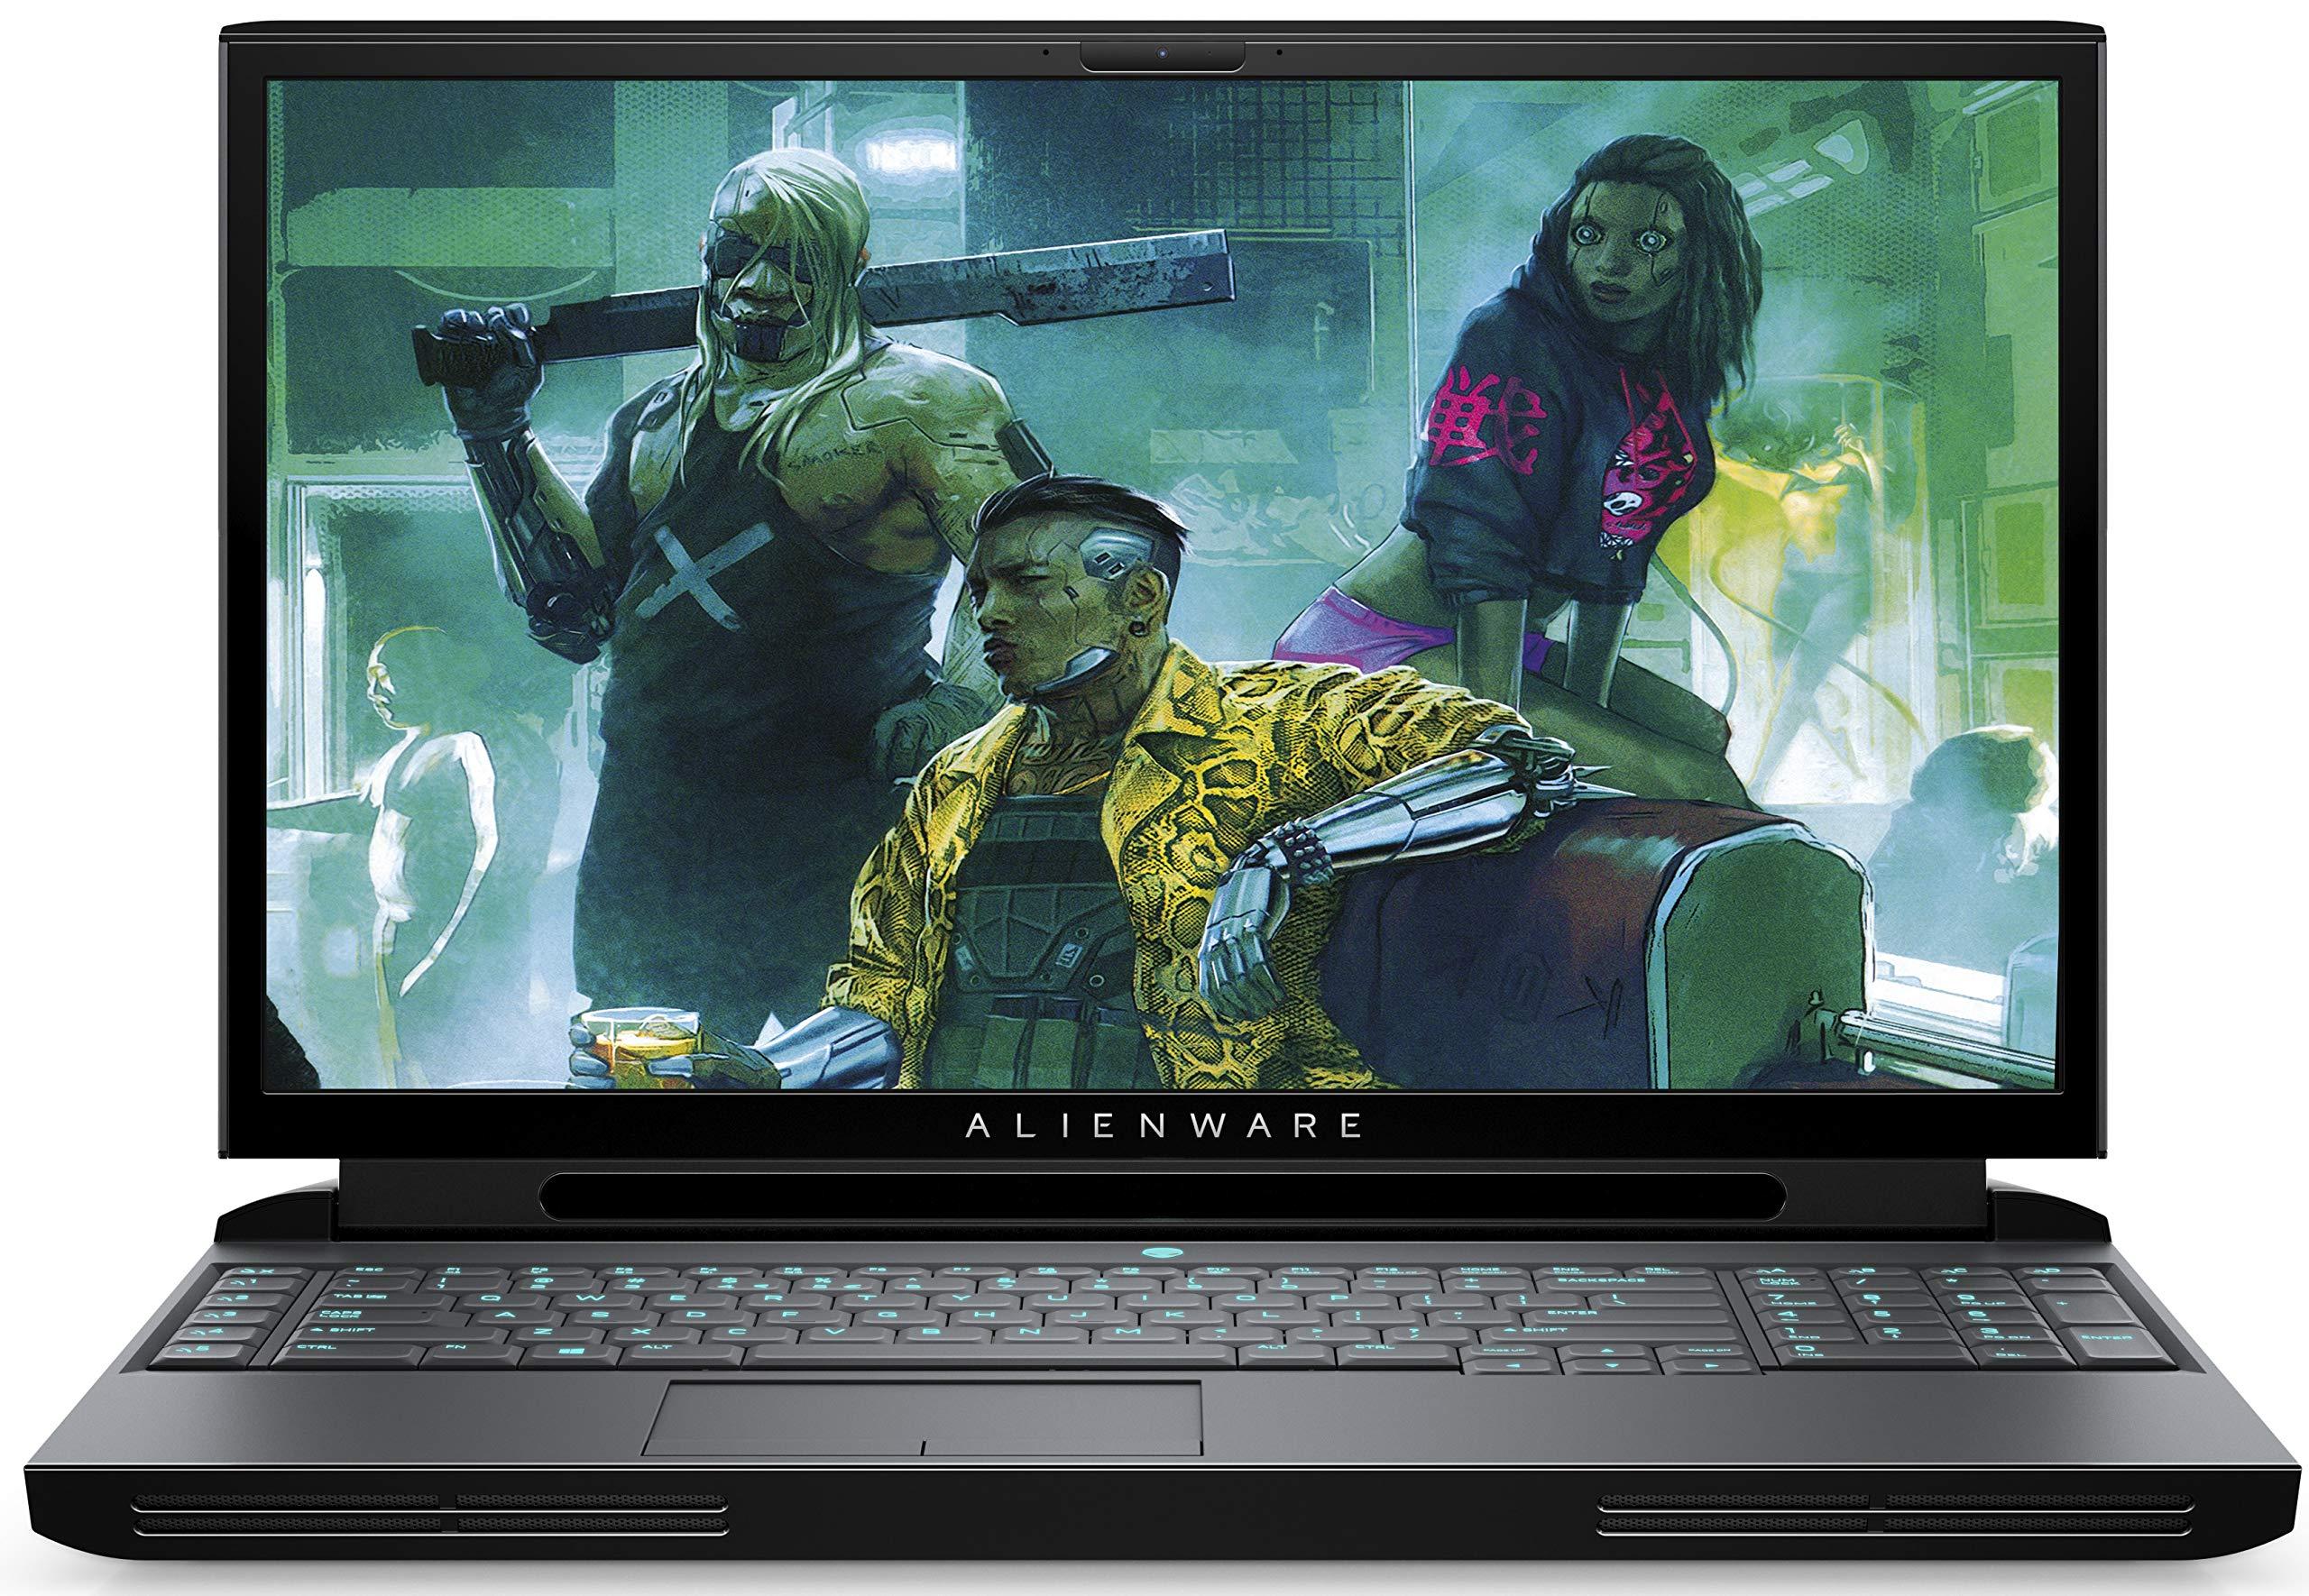 Alienware m15 R2 15.6 Inch FHD 144Hz with Tobii Eye Tracker Gaming Laptop – (Lunar Light) Intel Core i7-9750H, 16 GB RAM…